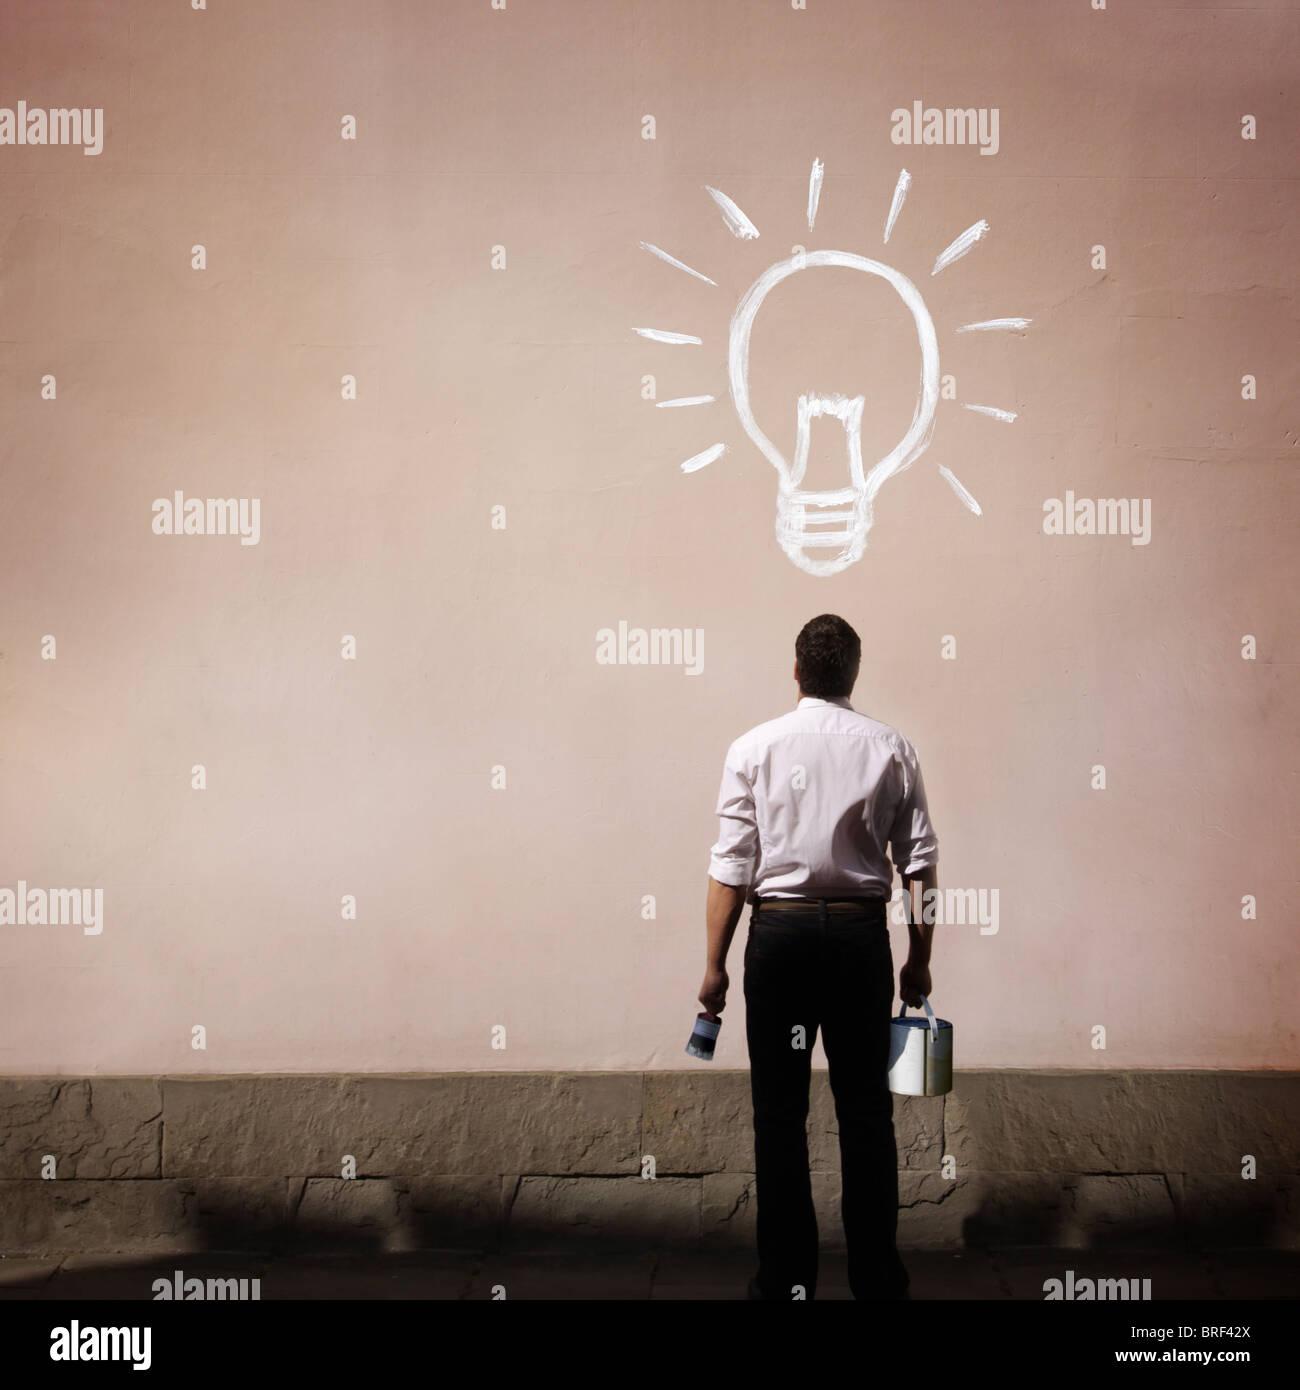 Mann mit Glühbirne an Wand gemalt Stockbild